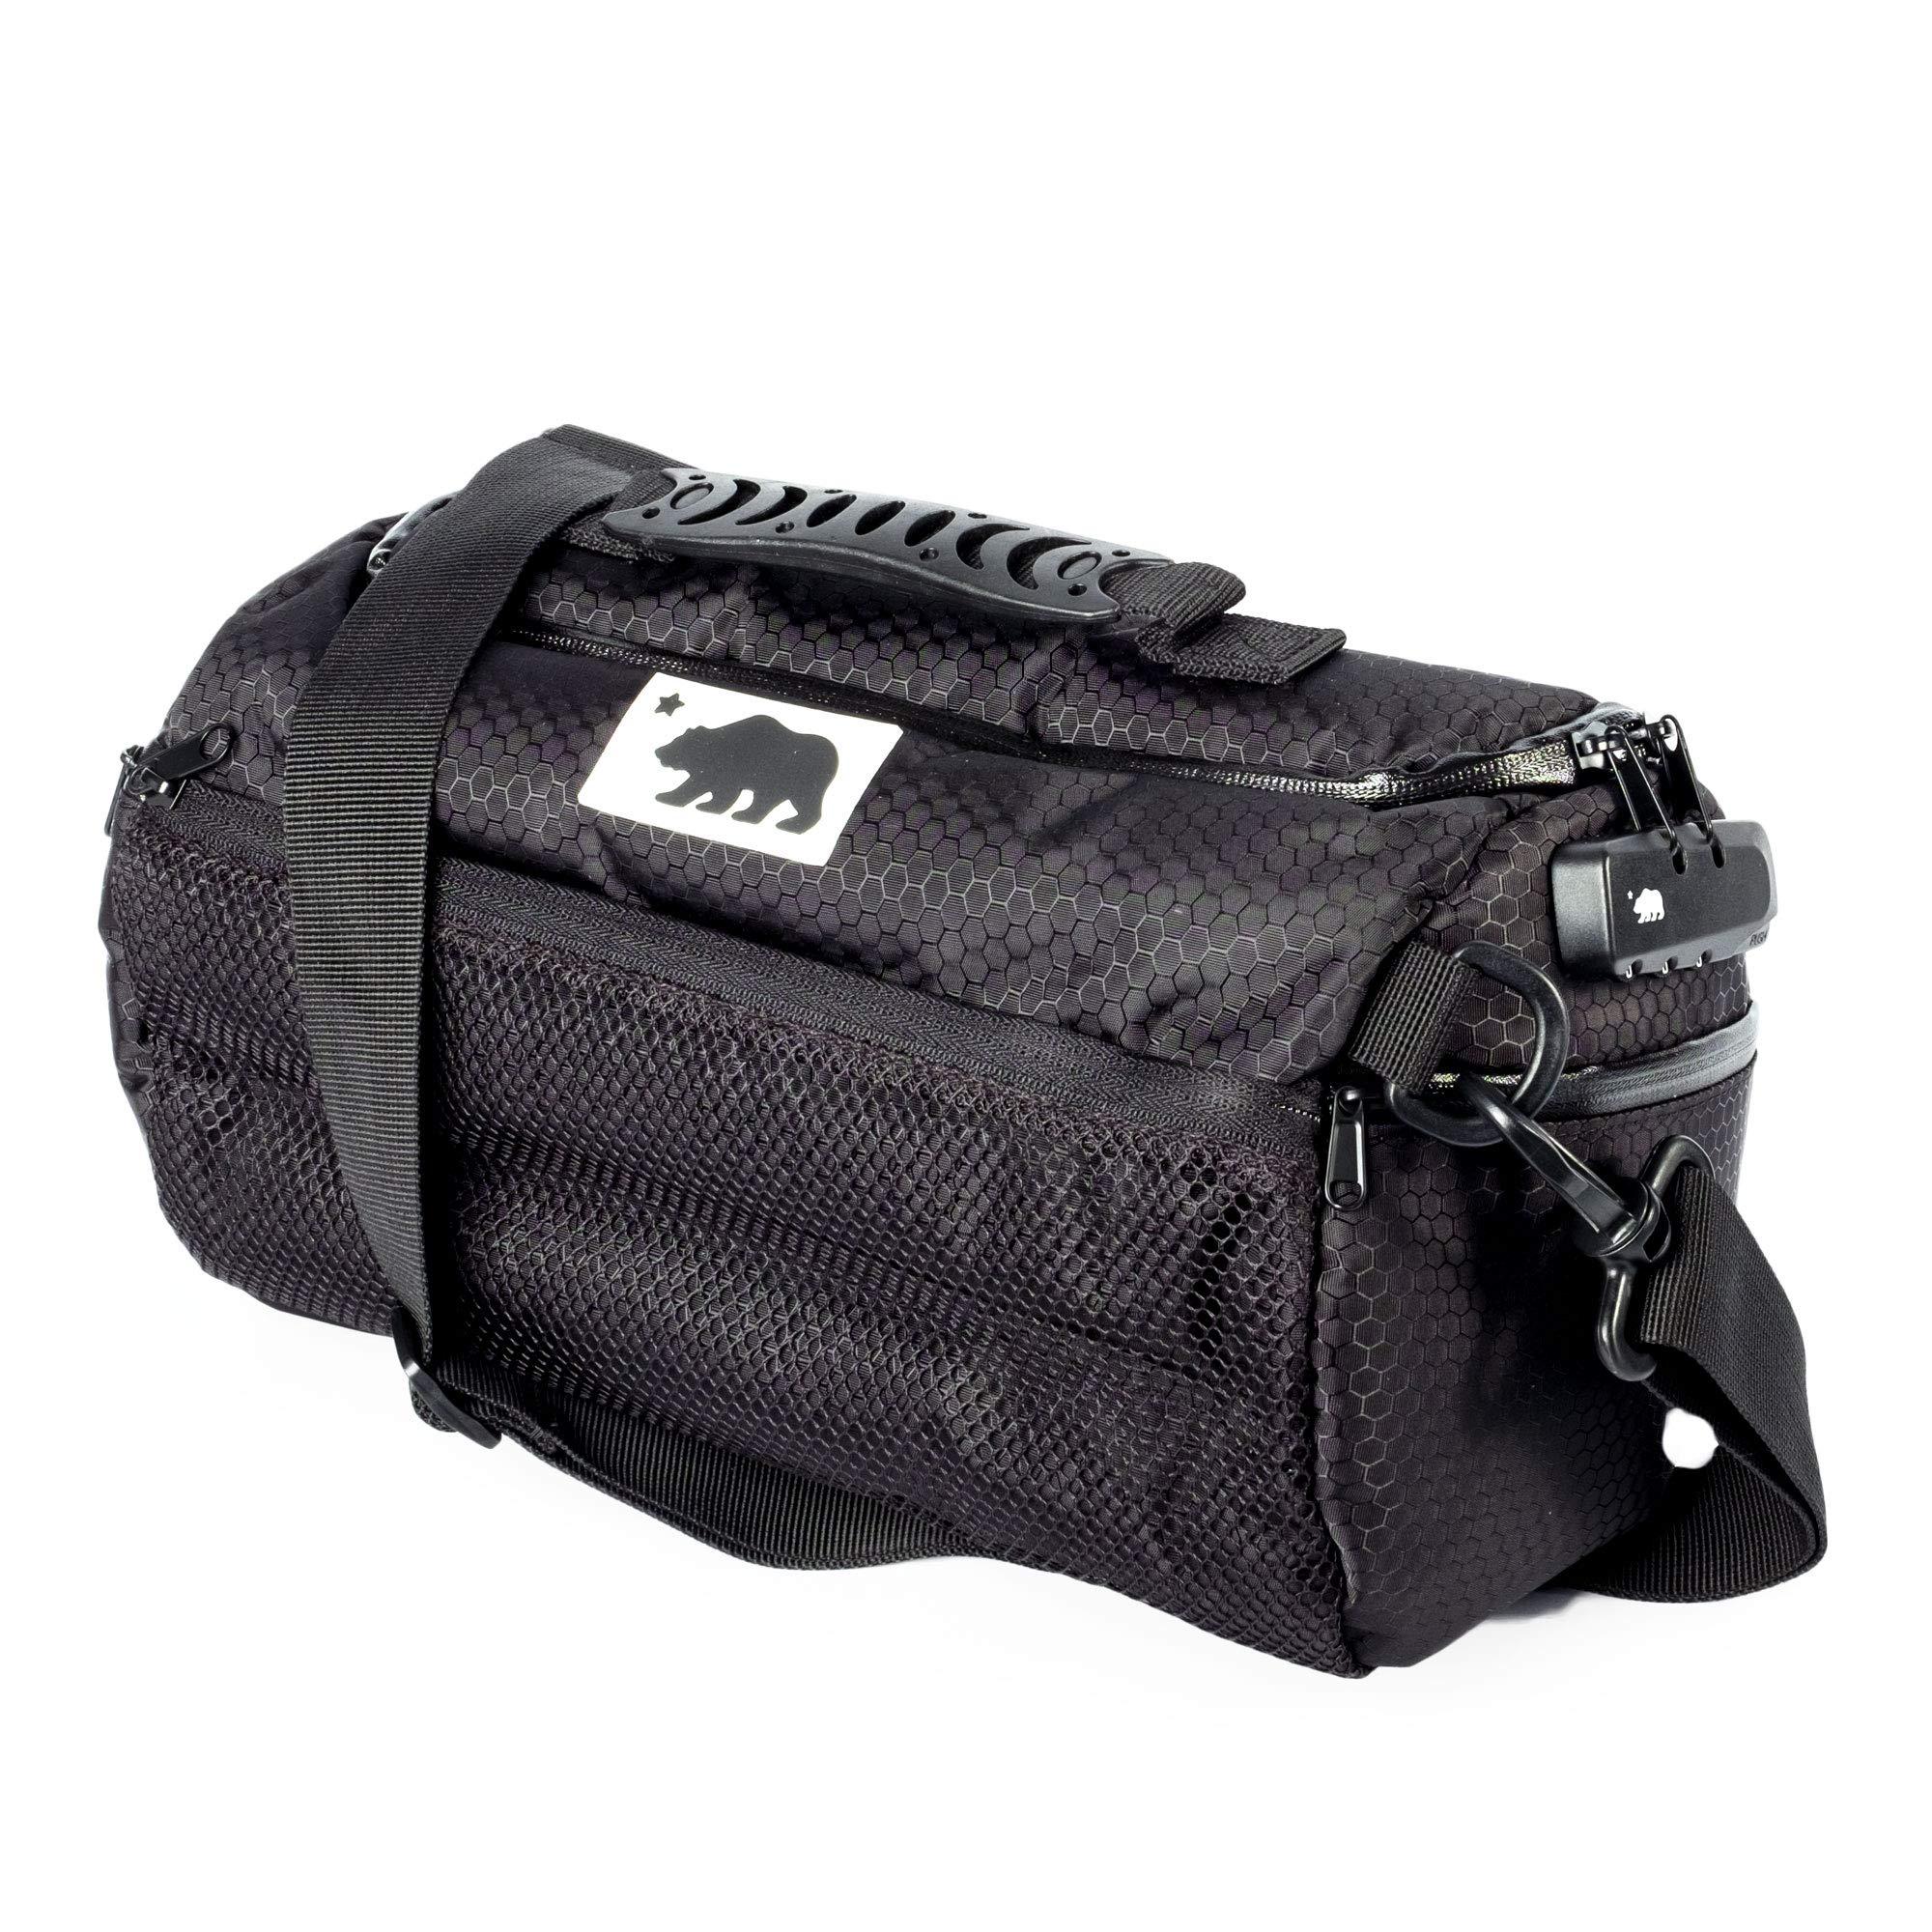 Cali Crusher 100% Smell Proof Duffle Bag w/Combo Lock (Black, 12in)